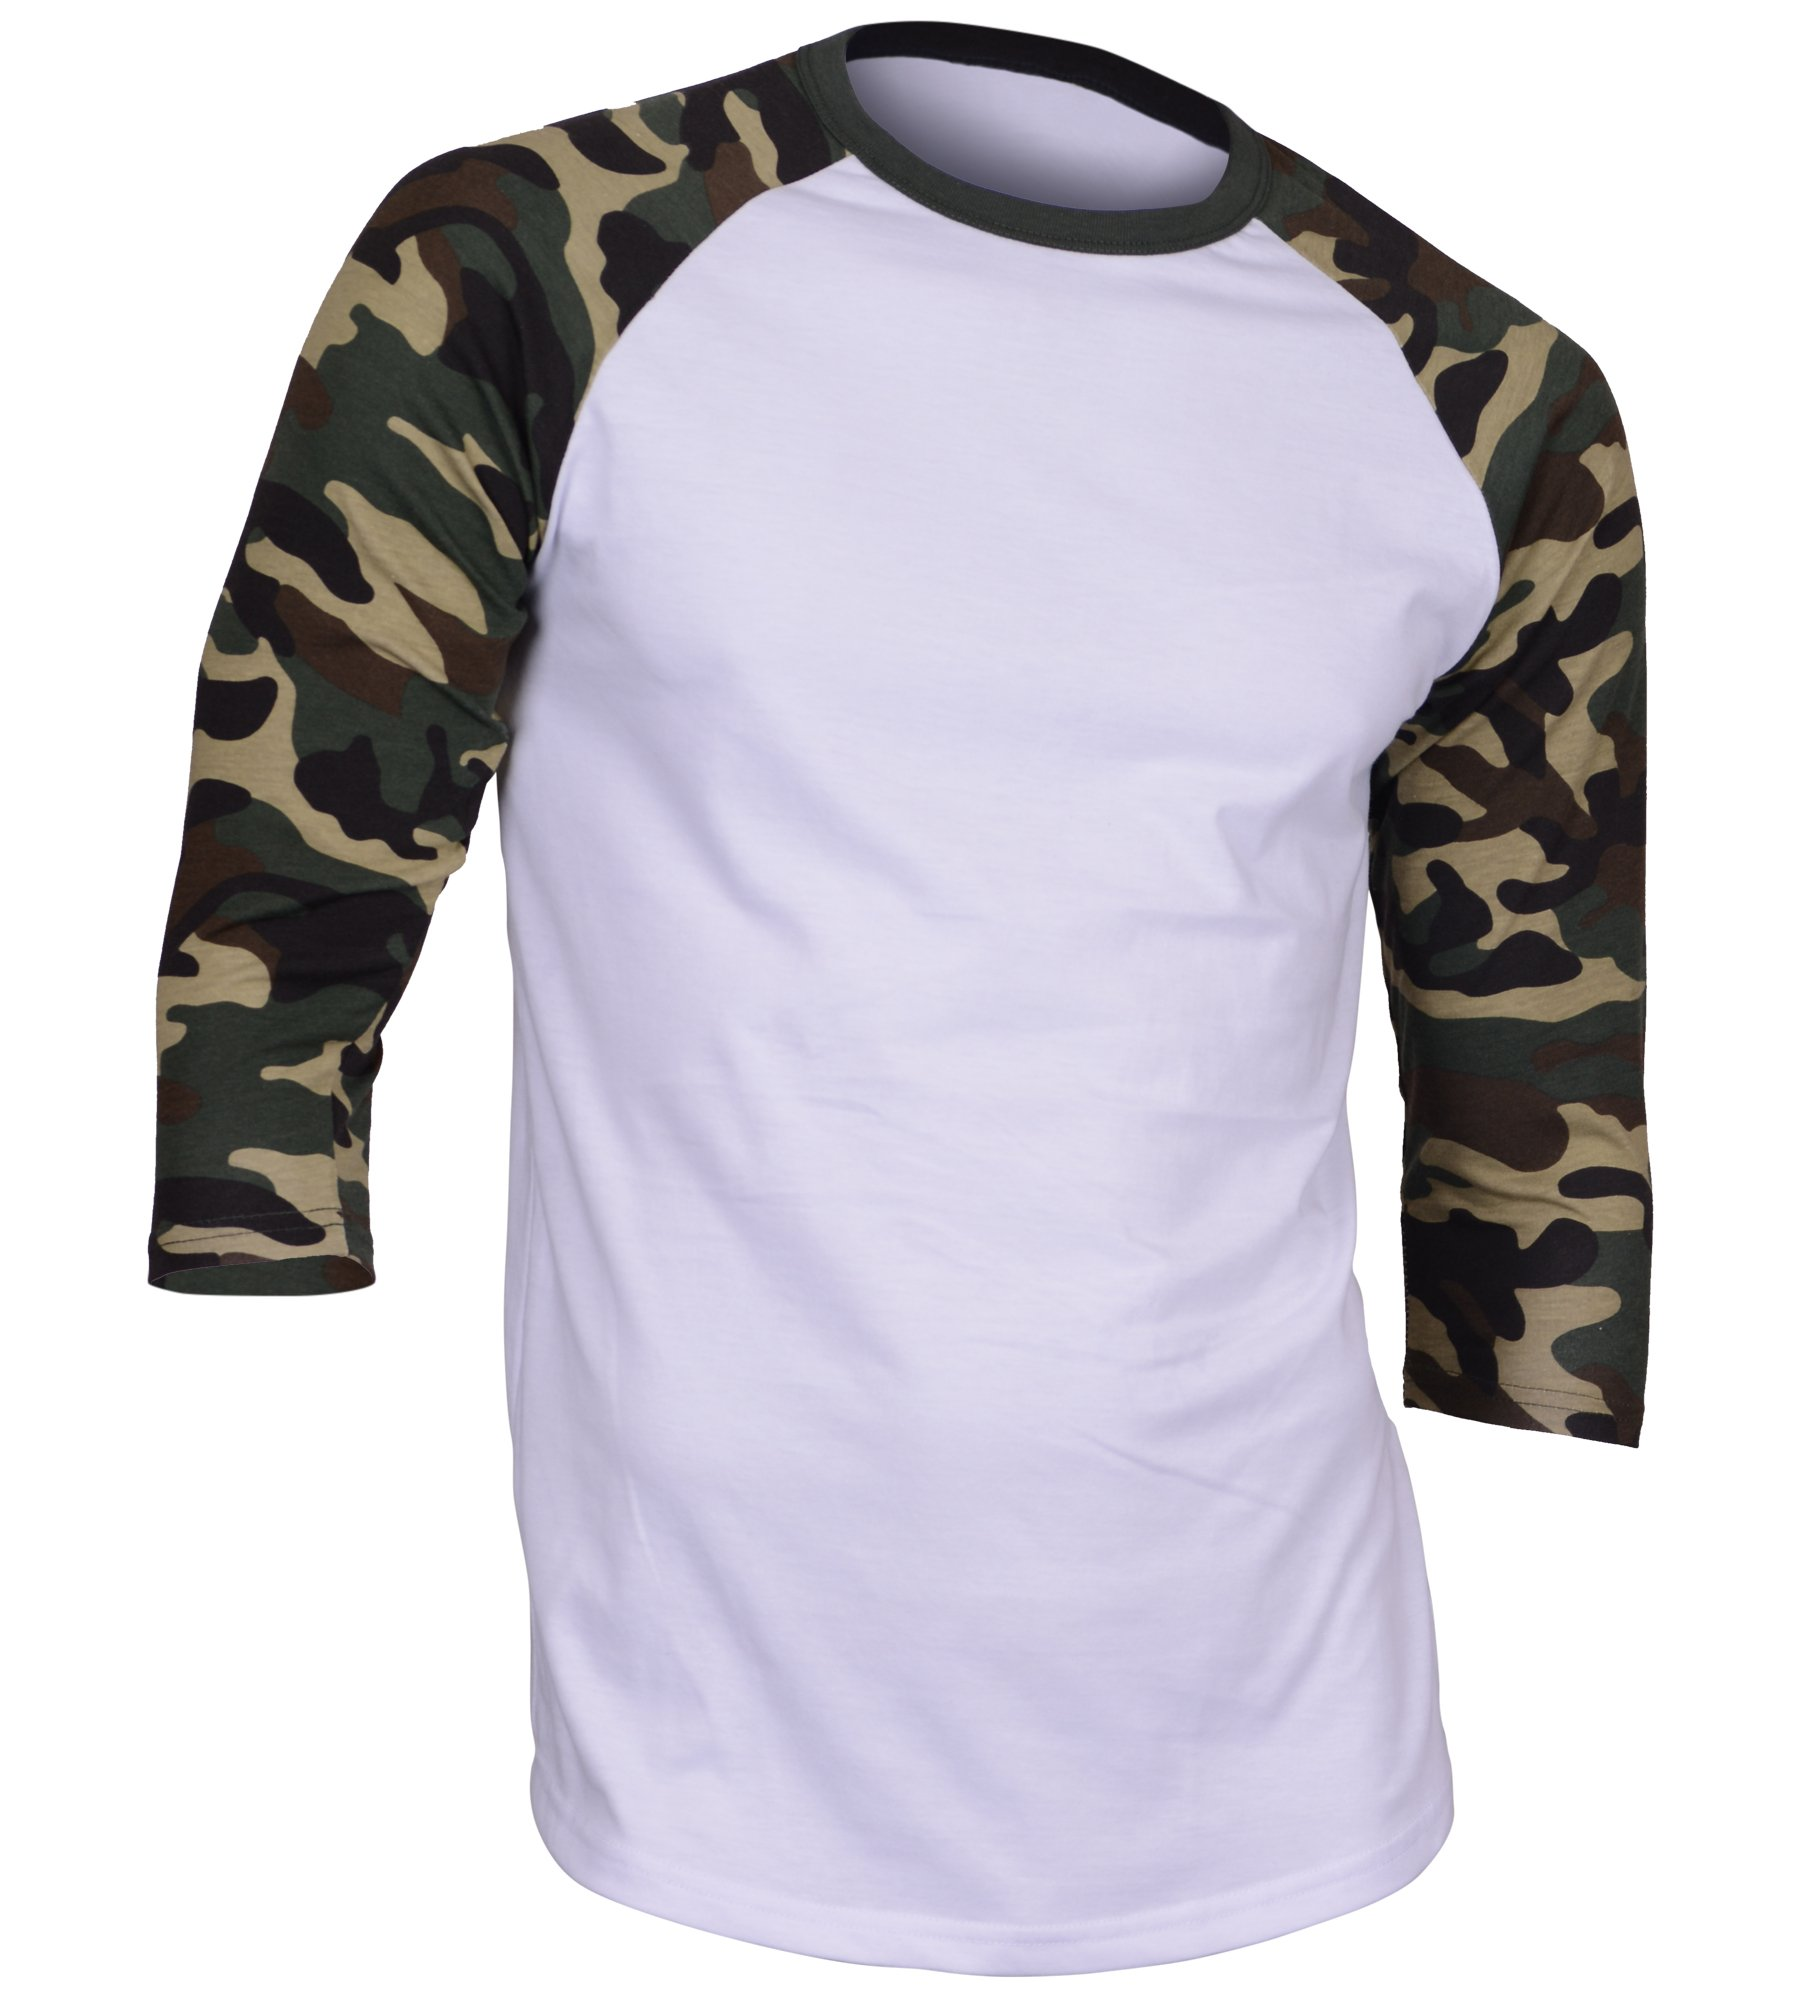 Dream USA Men's Casual 3/4 Sleeve Baseball Tshirt Raglan Jersey Shirt Dark Camo XL